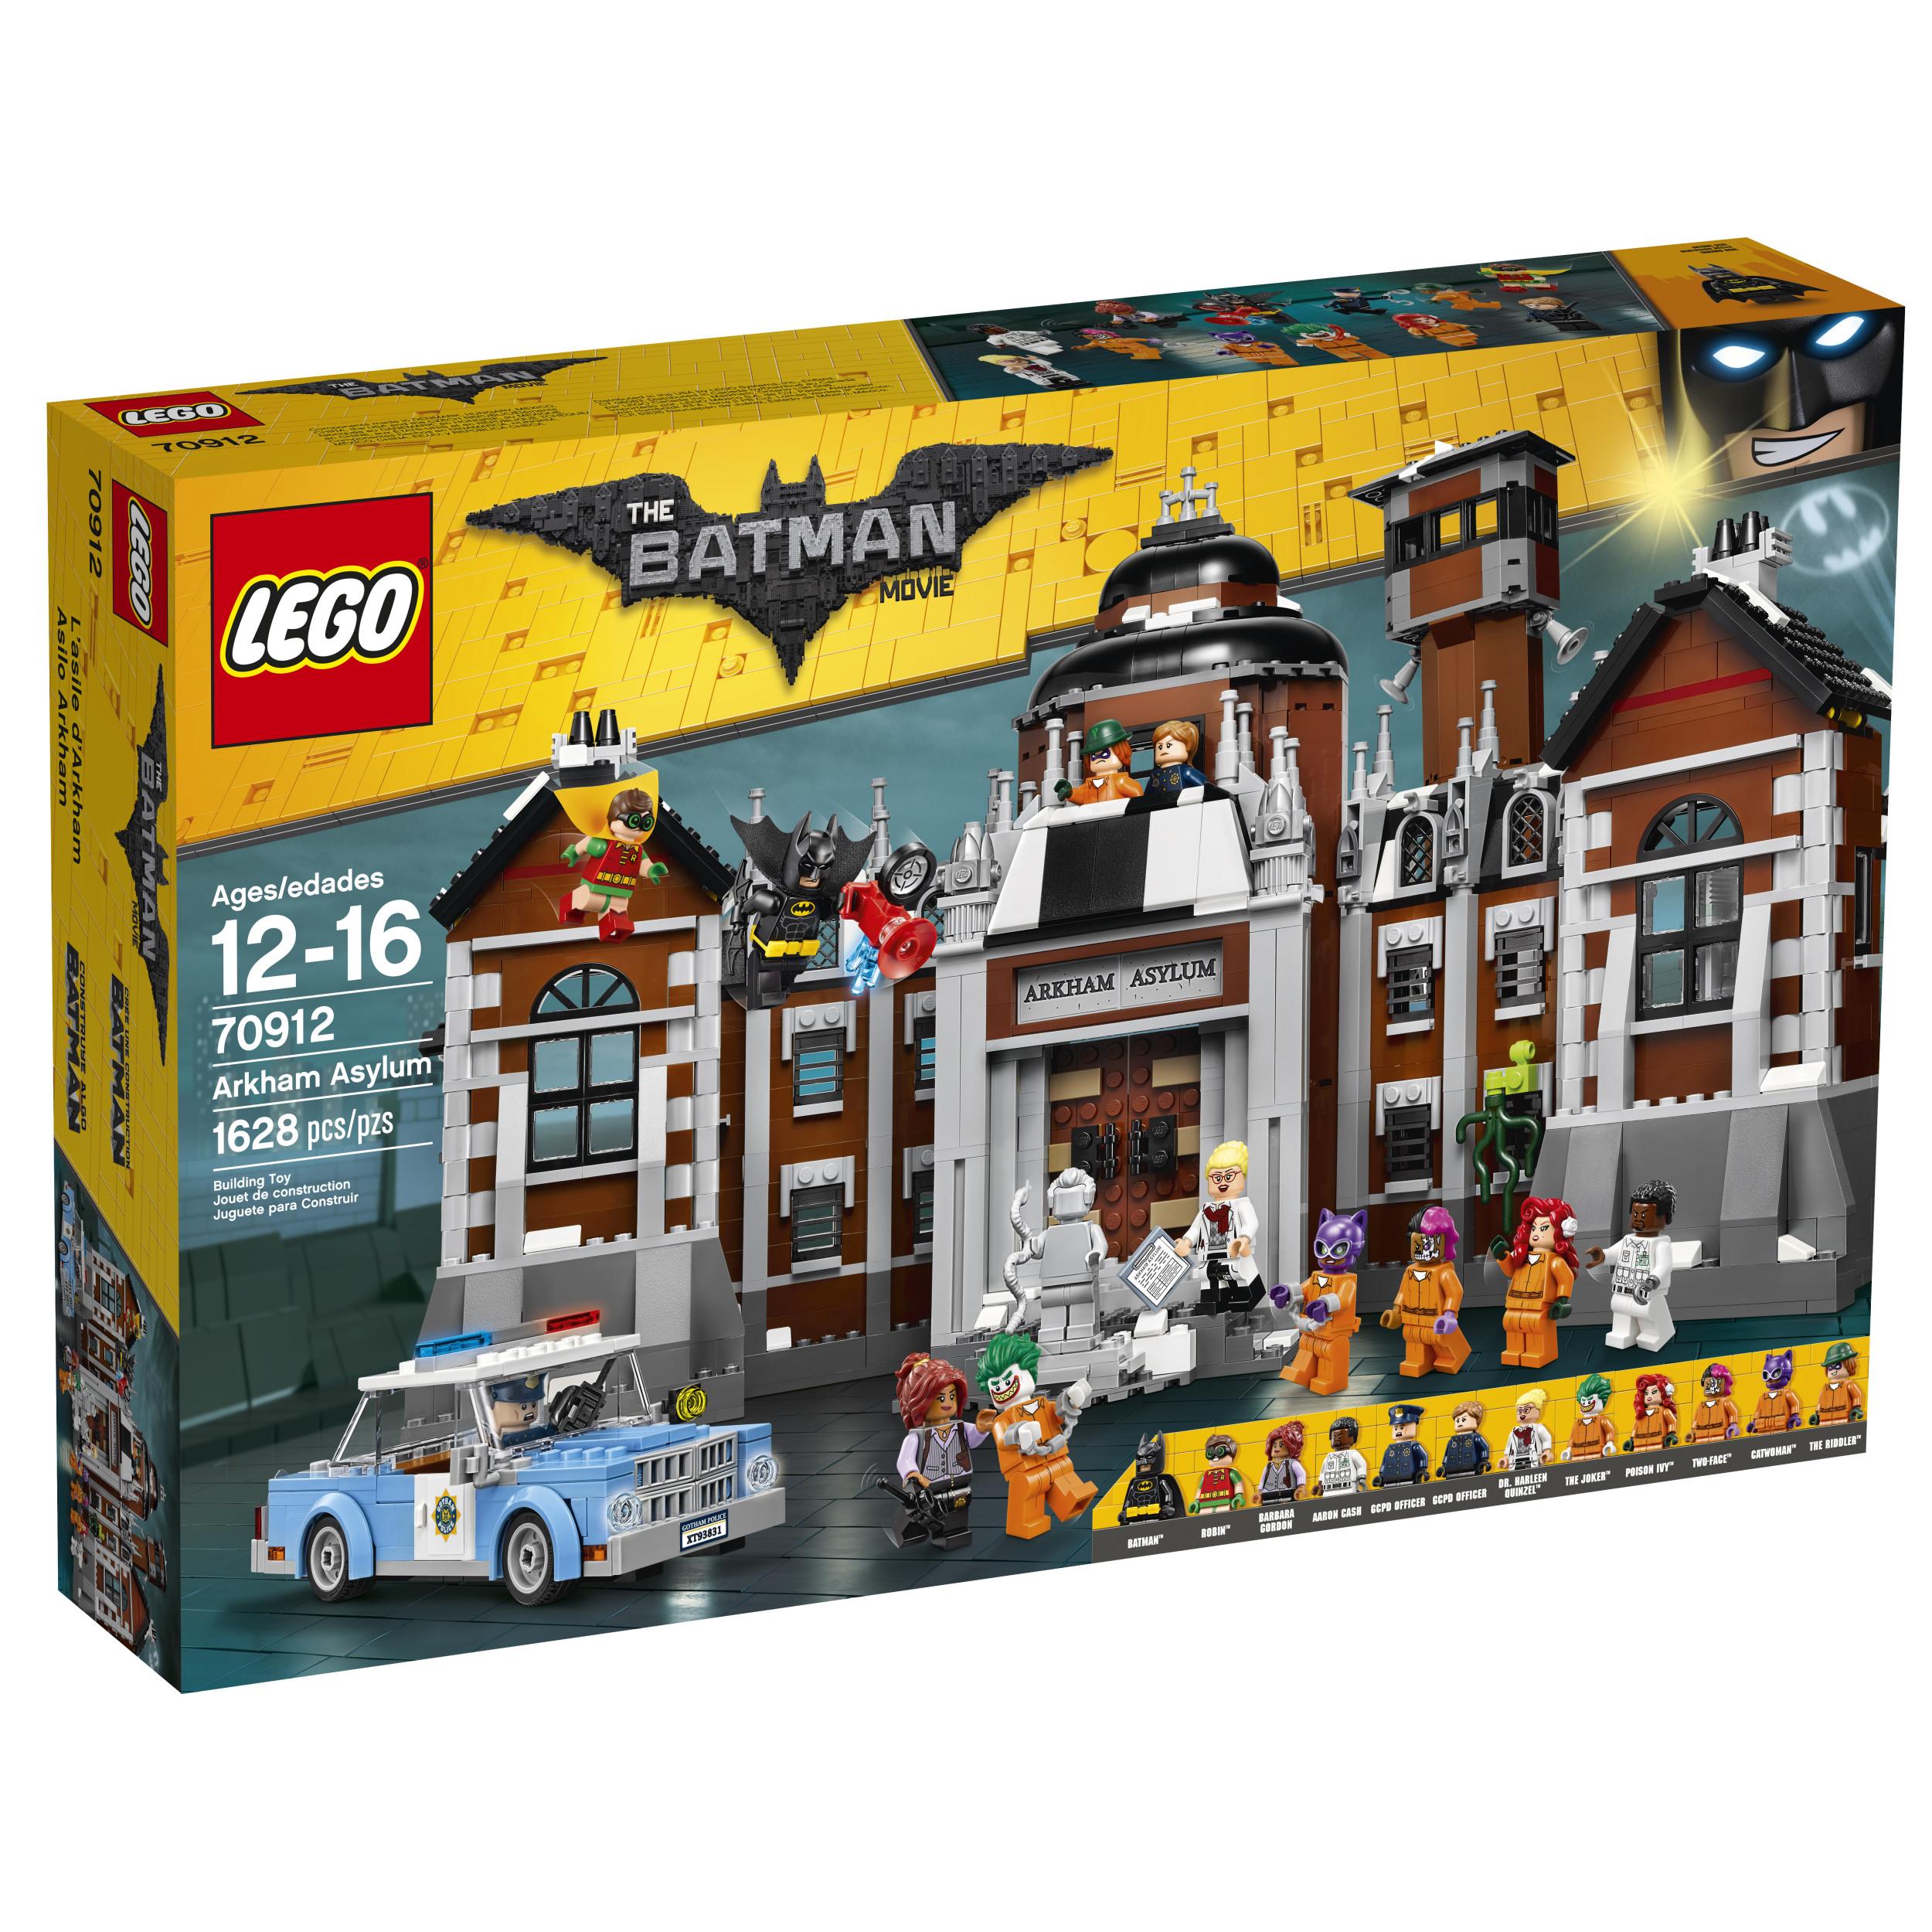 LEGO 70912 Batman Movie Arkham Asylum (1628 Pieces) 27% off! $109.99